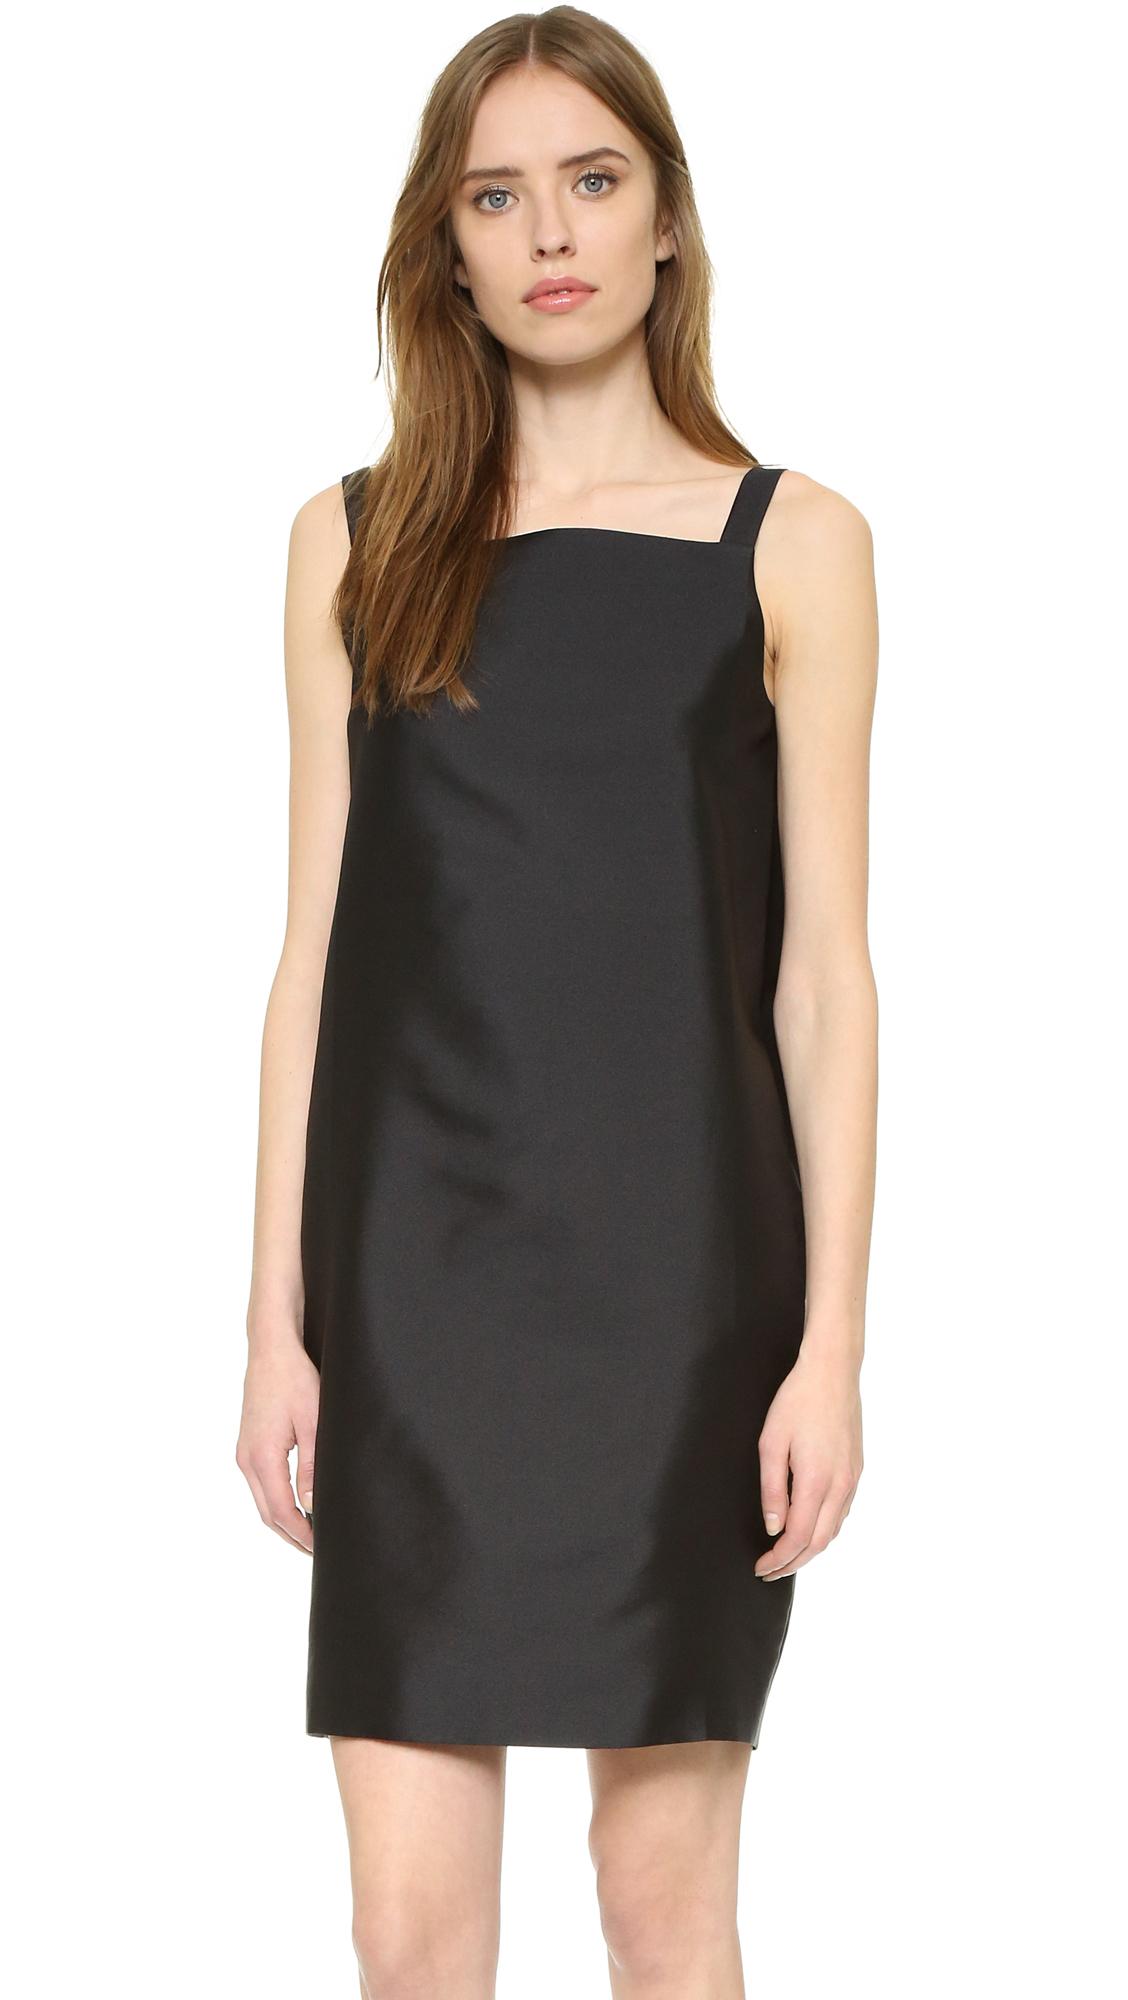 Nina ricci Sleeveless Dress in Black | Lyst